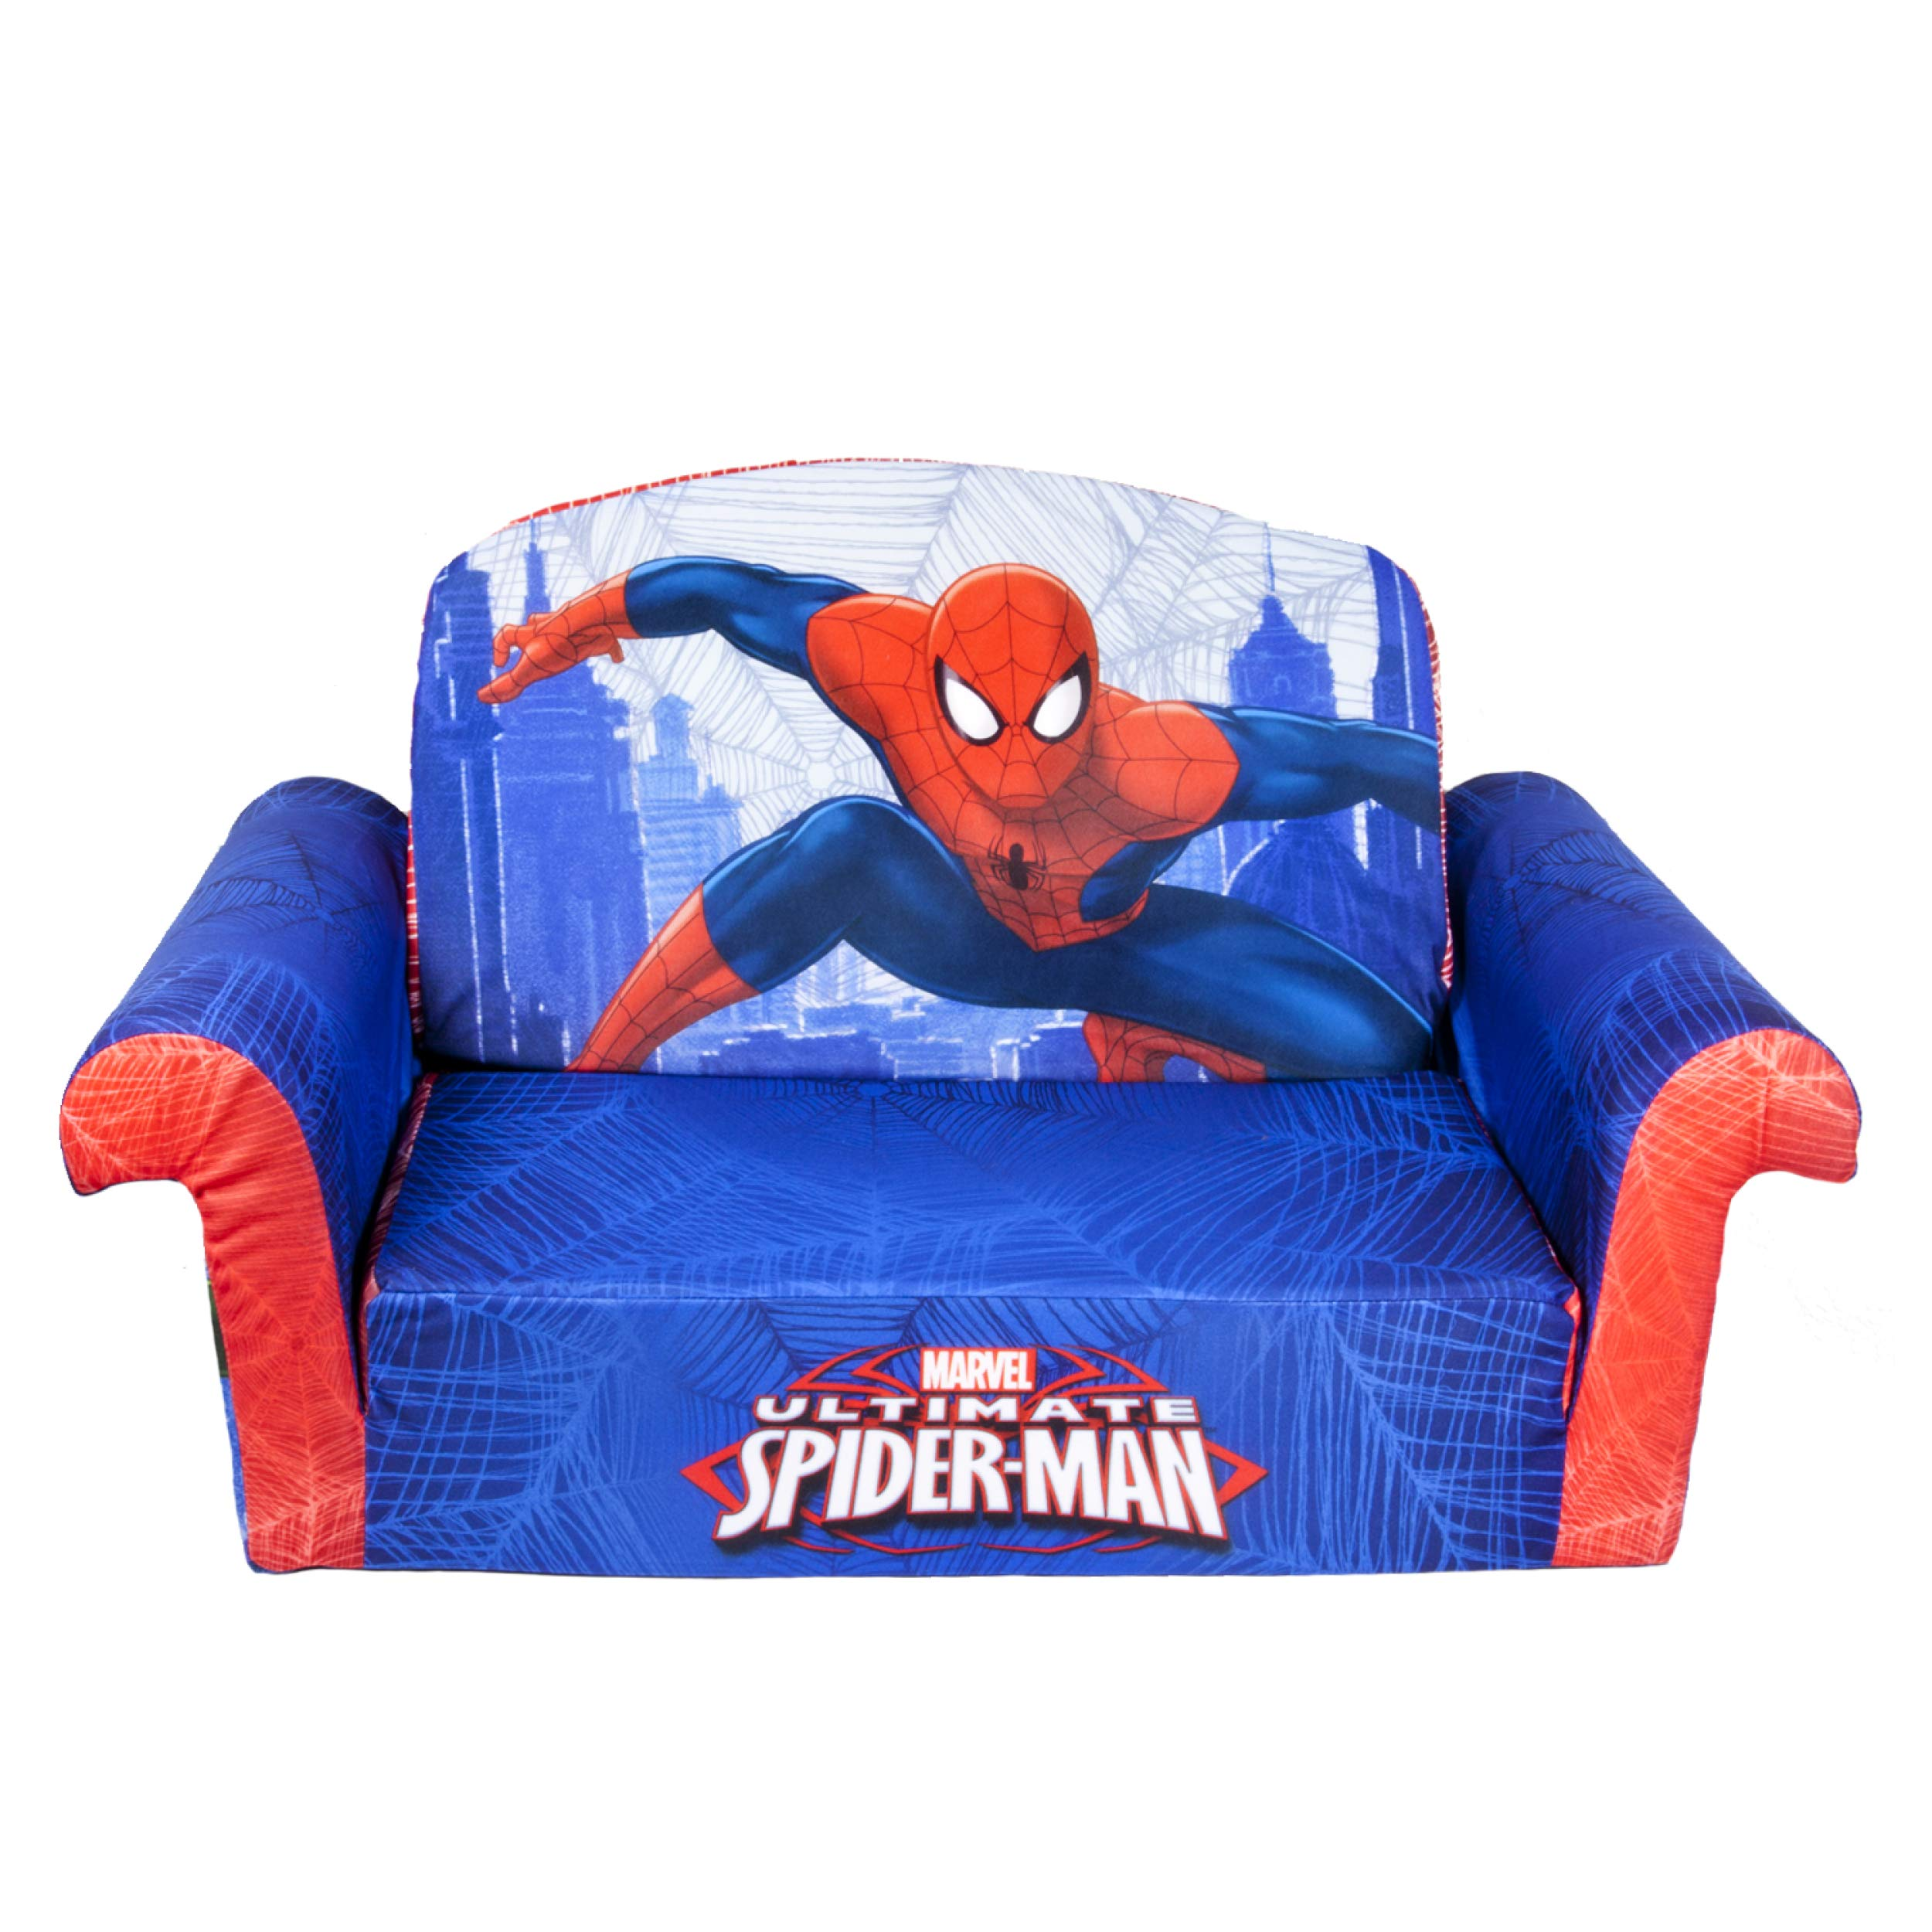 Marshmallow Furniture Children's 2 in 1 Flip Open Foam Sofa, Marvel Spiderman, by Spin Master